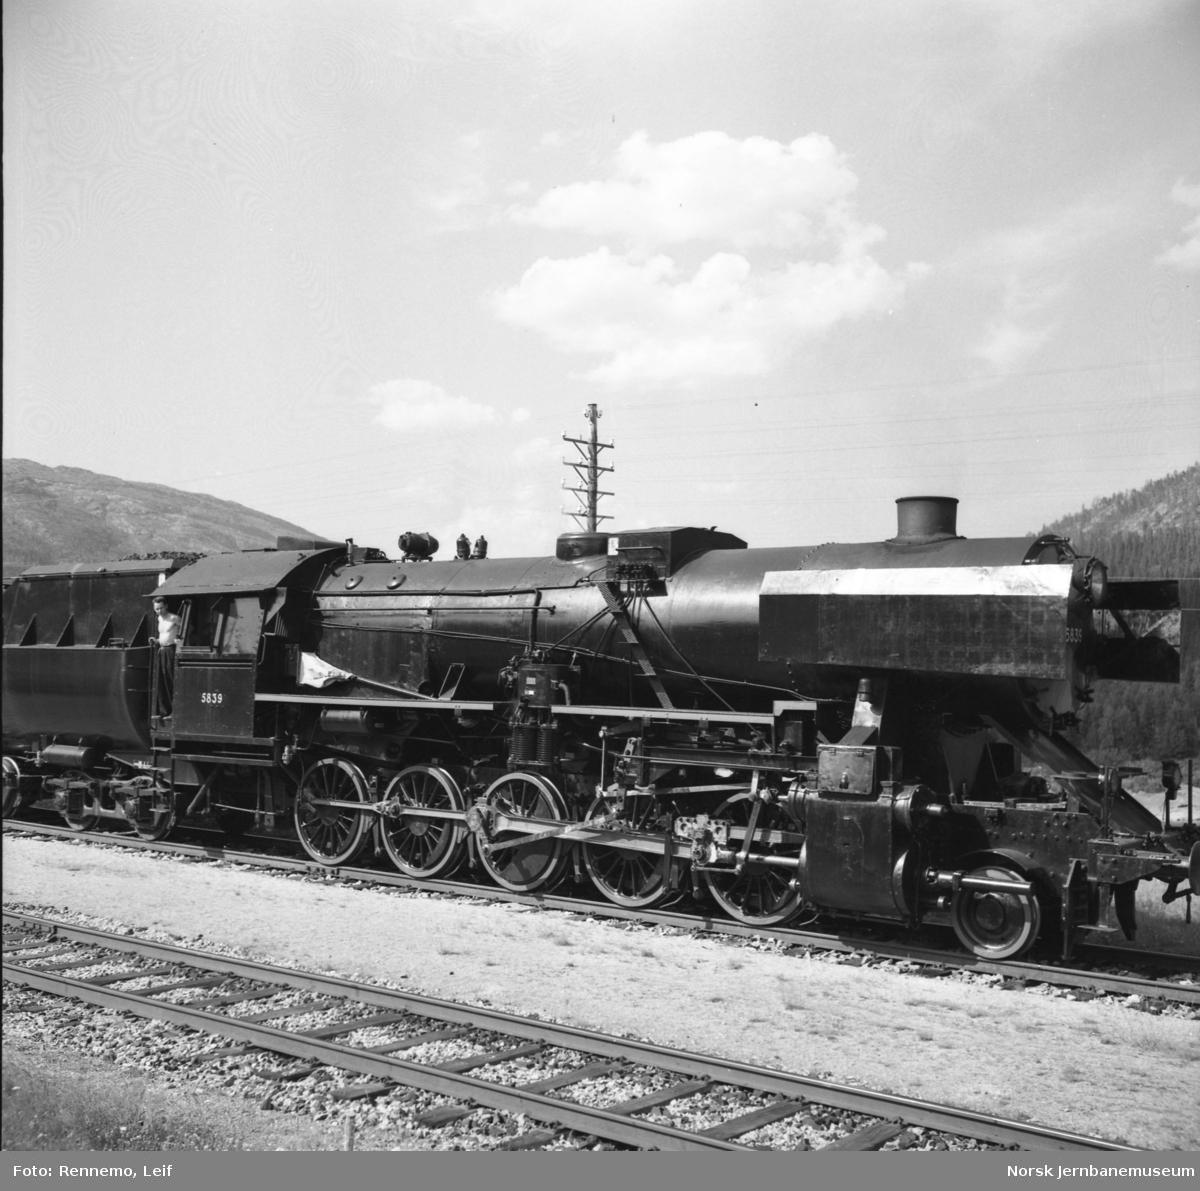 Damplokomotiv type 63a nr. 5839